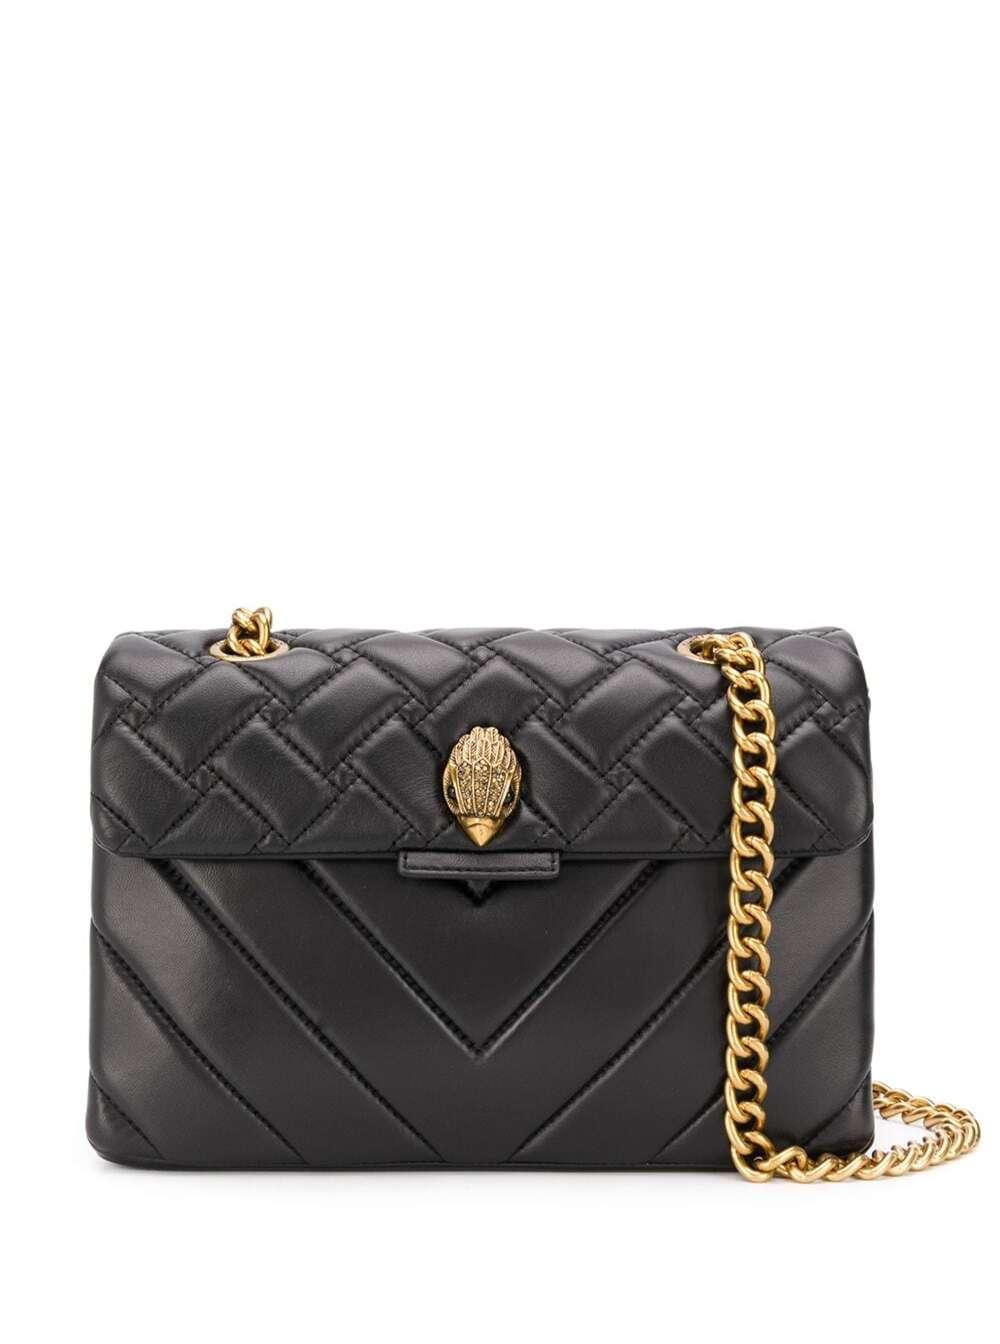 Kensington Black Leather Crossbody Bag With Logo